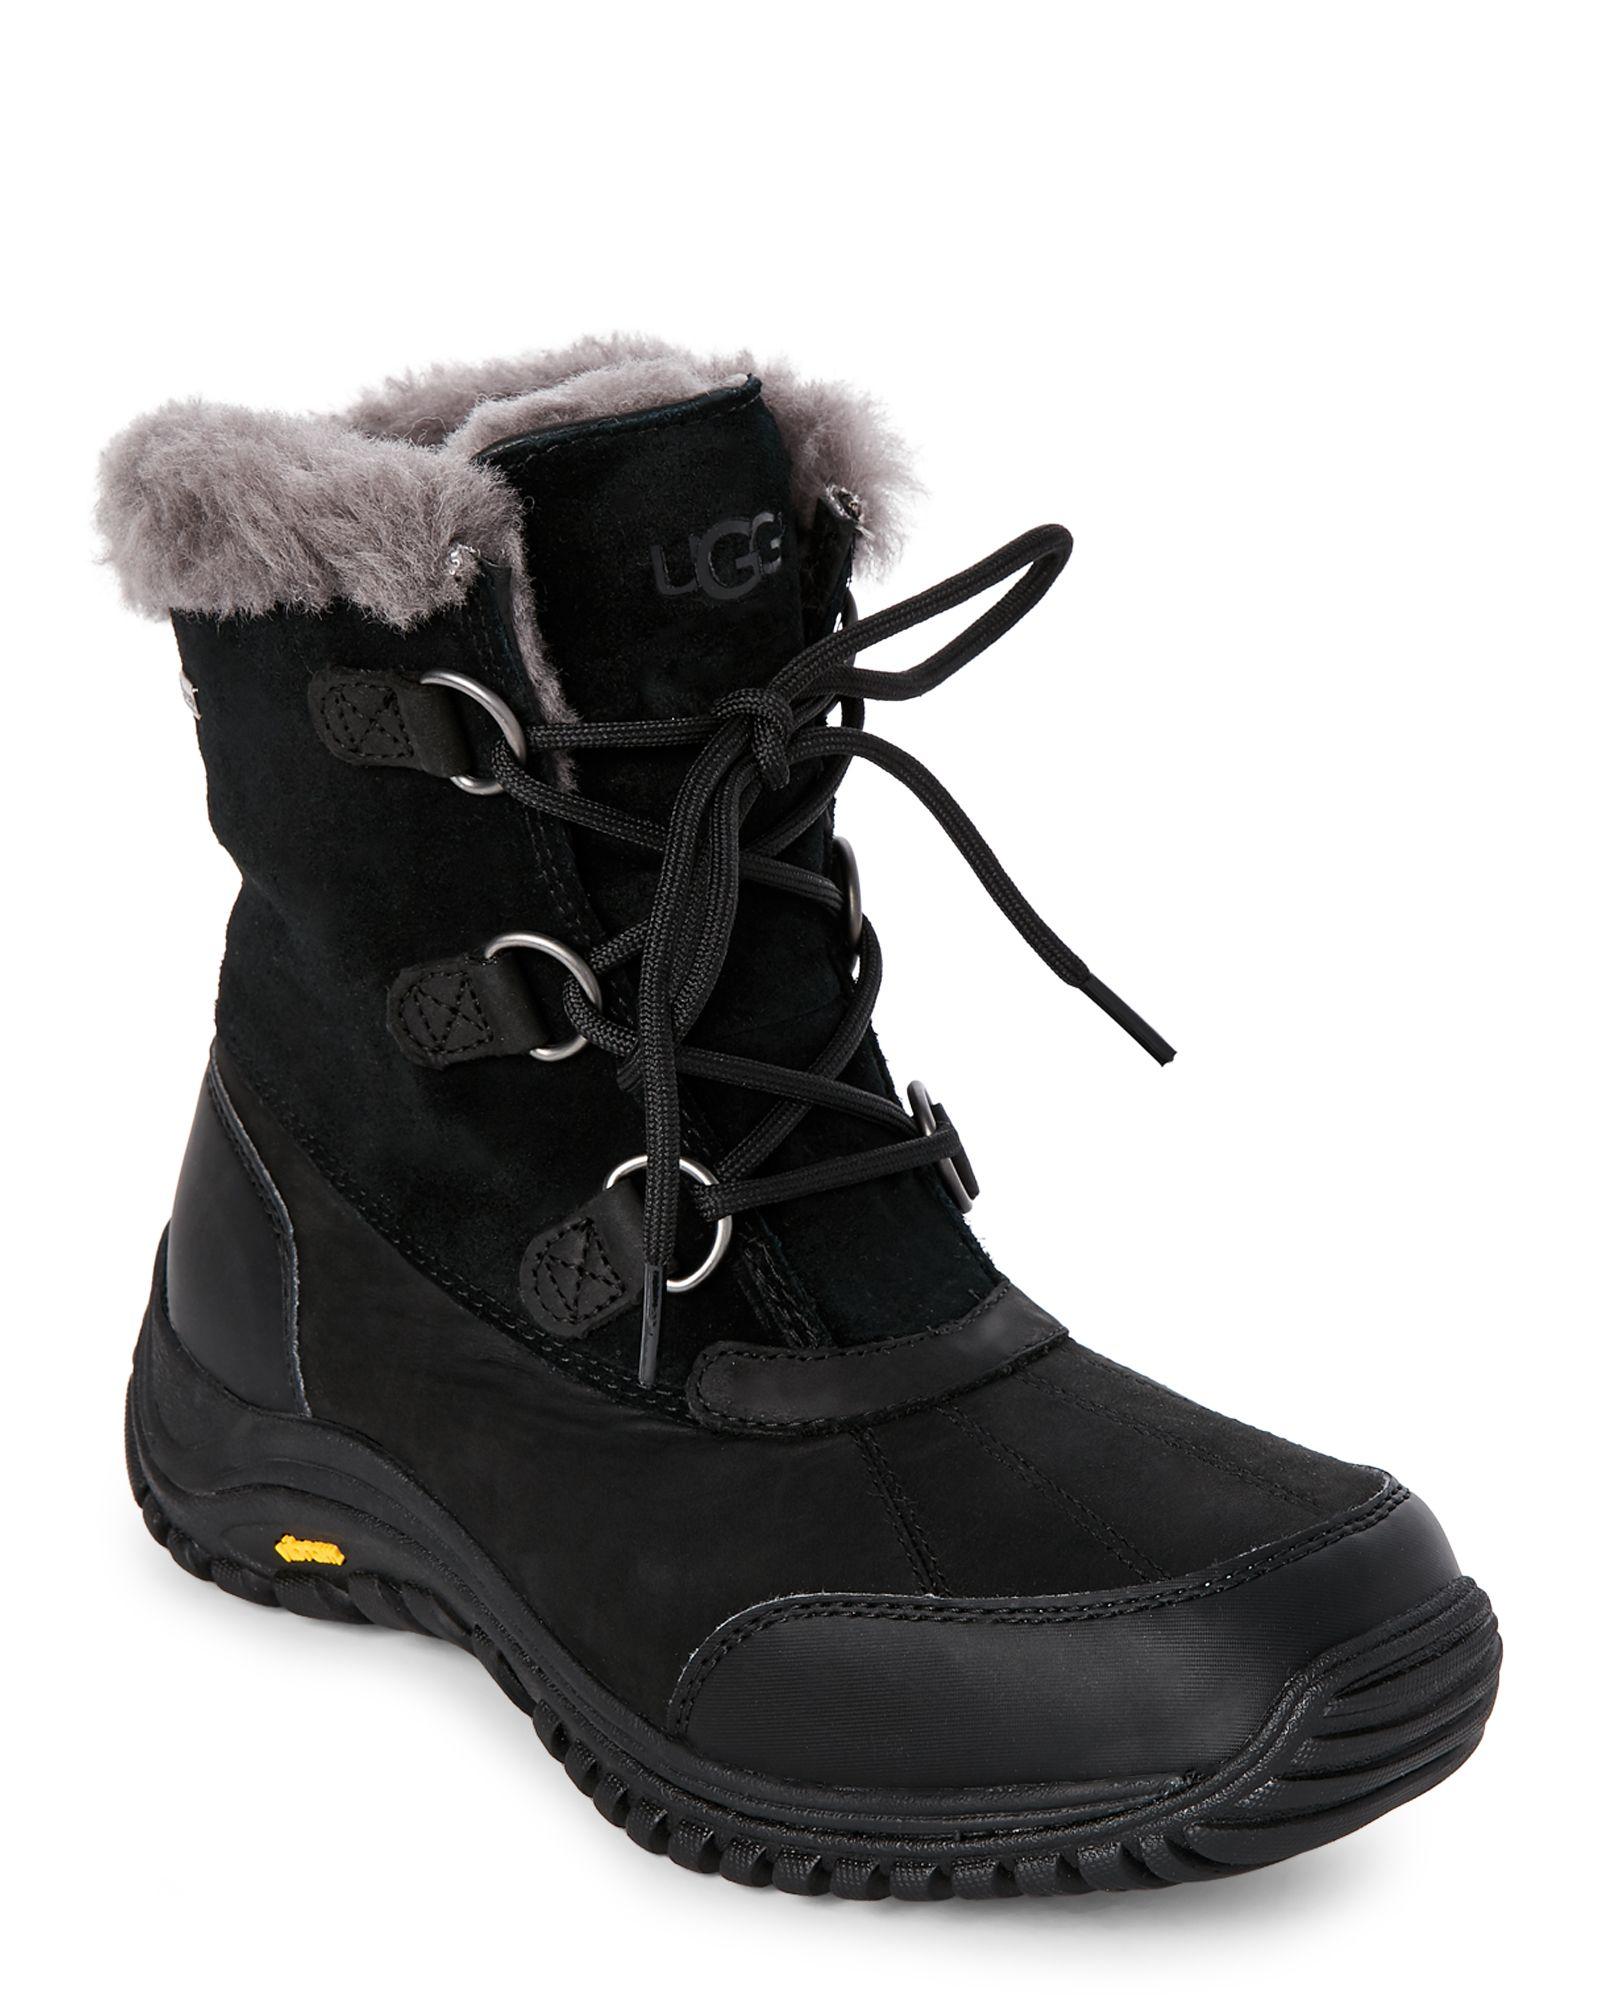 7f52b0e3b7e Ostrander Waterproof Black Ankle Boots | *Apparel & Accessories ...